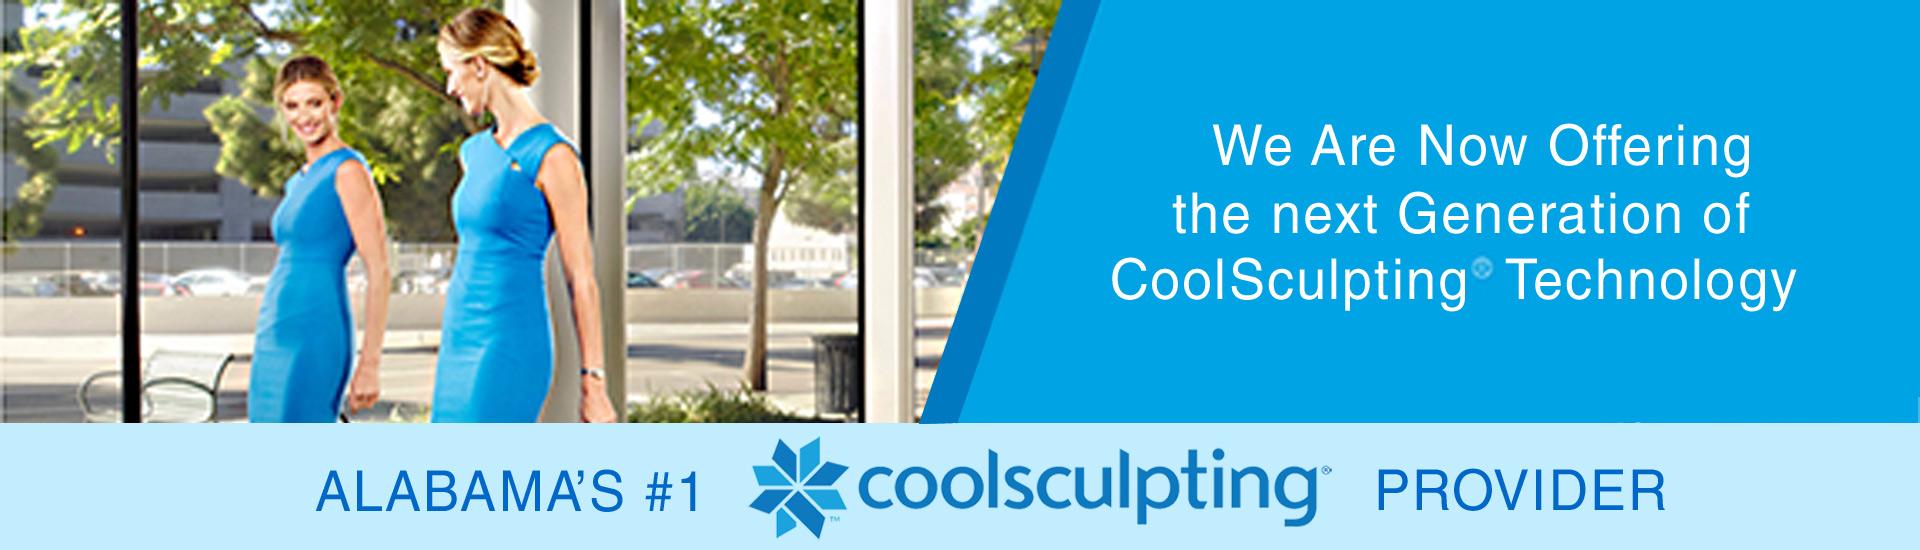 coolsculpting-Plus-prescription-asethetic-and-wellness